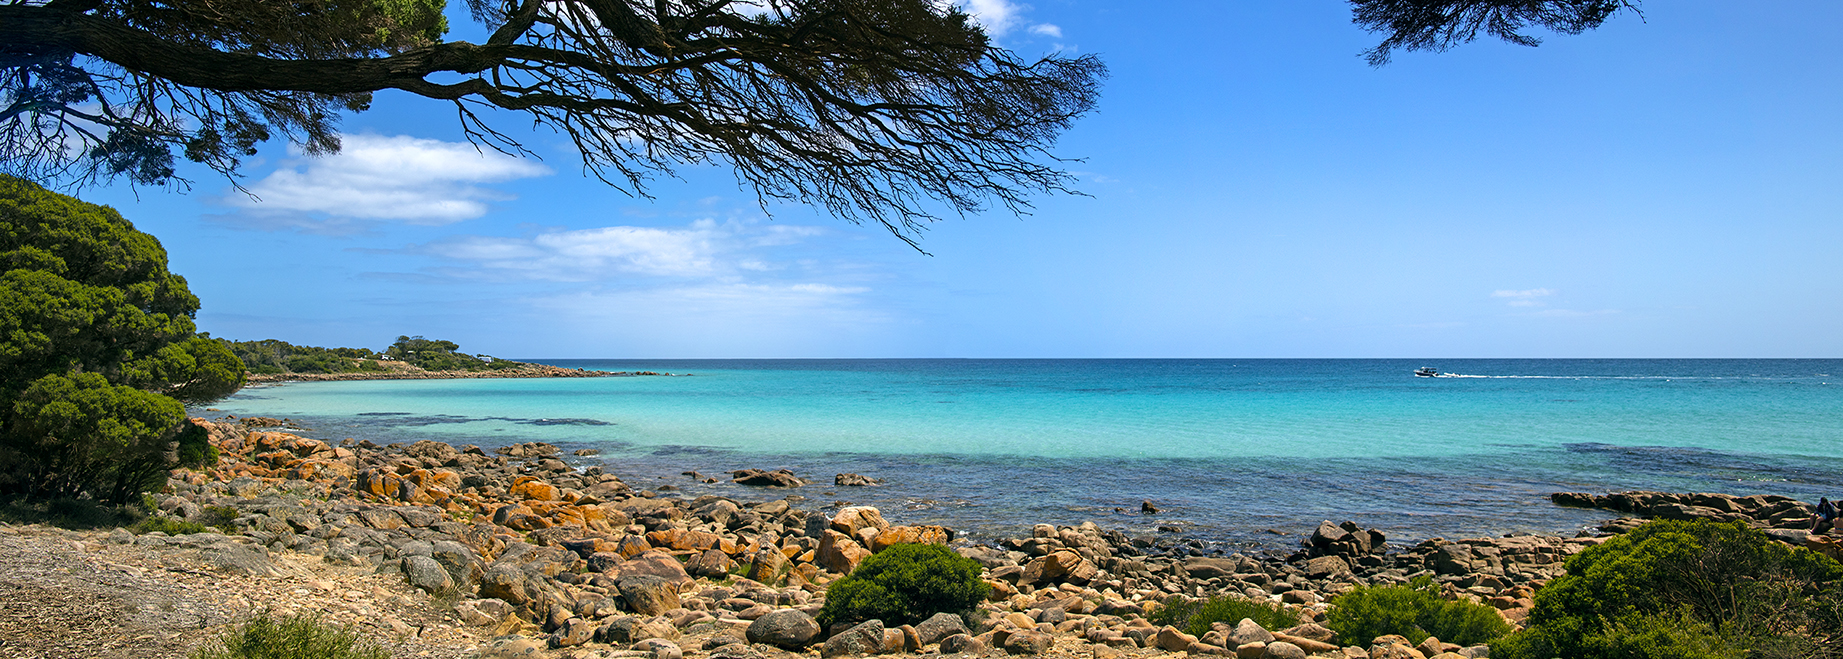 Meelup-Rocky-Beach-7mb